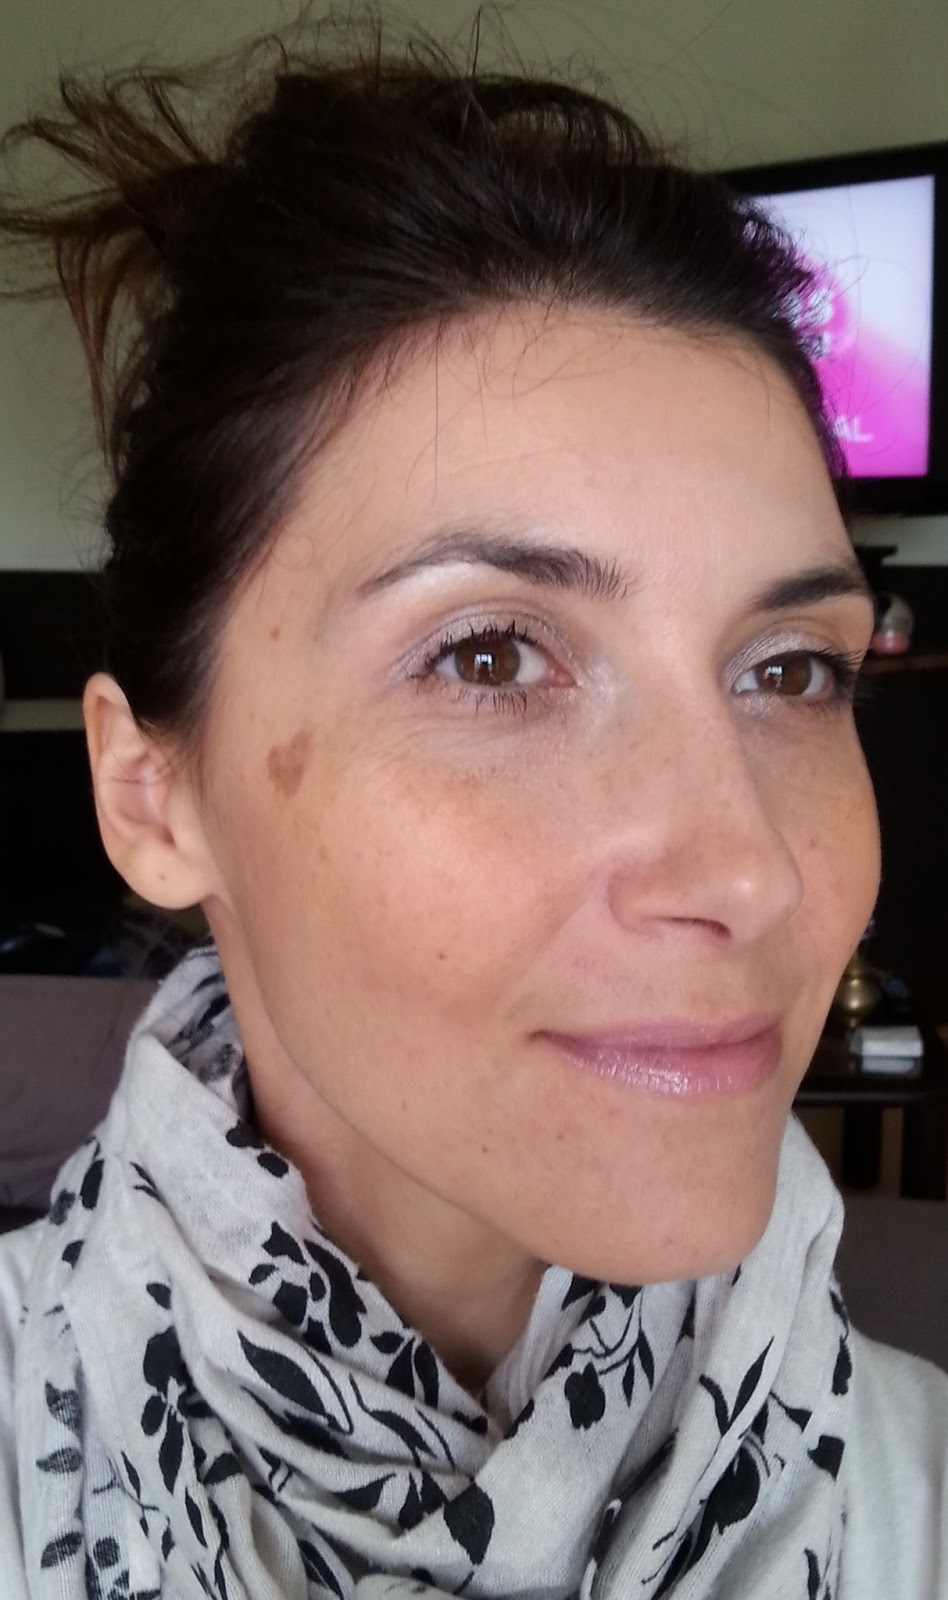 conseils beaute teint fatigu maquillage 2 zelia 39 s makeup book. Black Bedroom Furniture Sets. Home Design Ideas